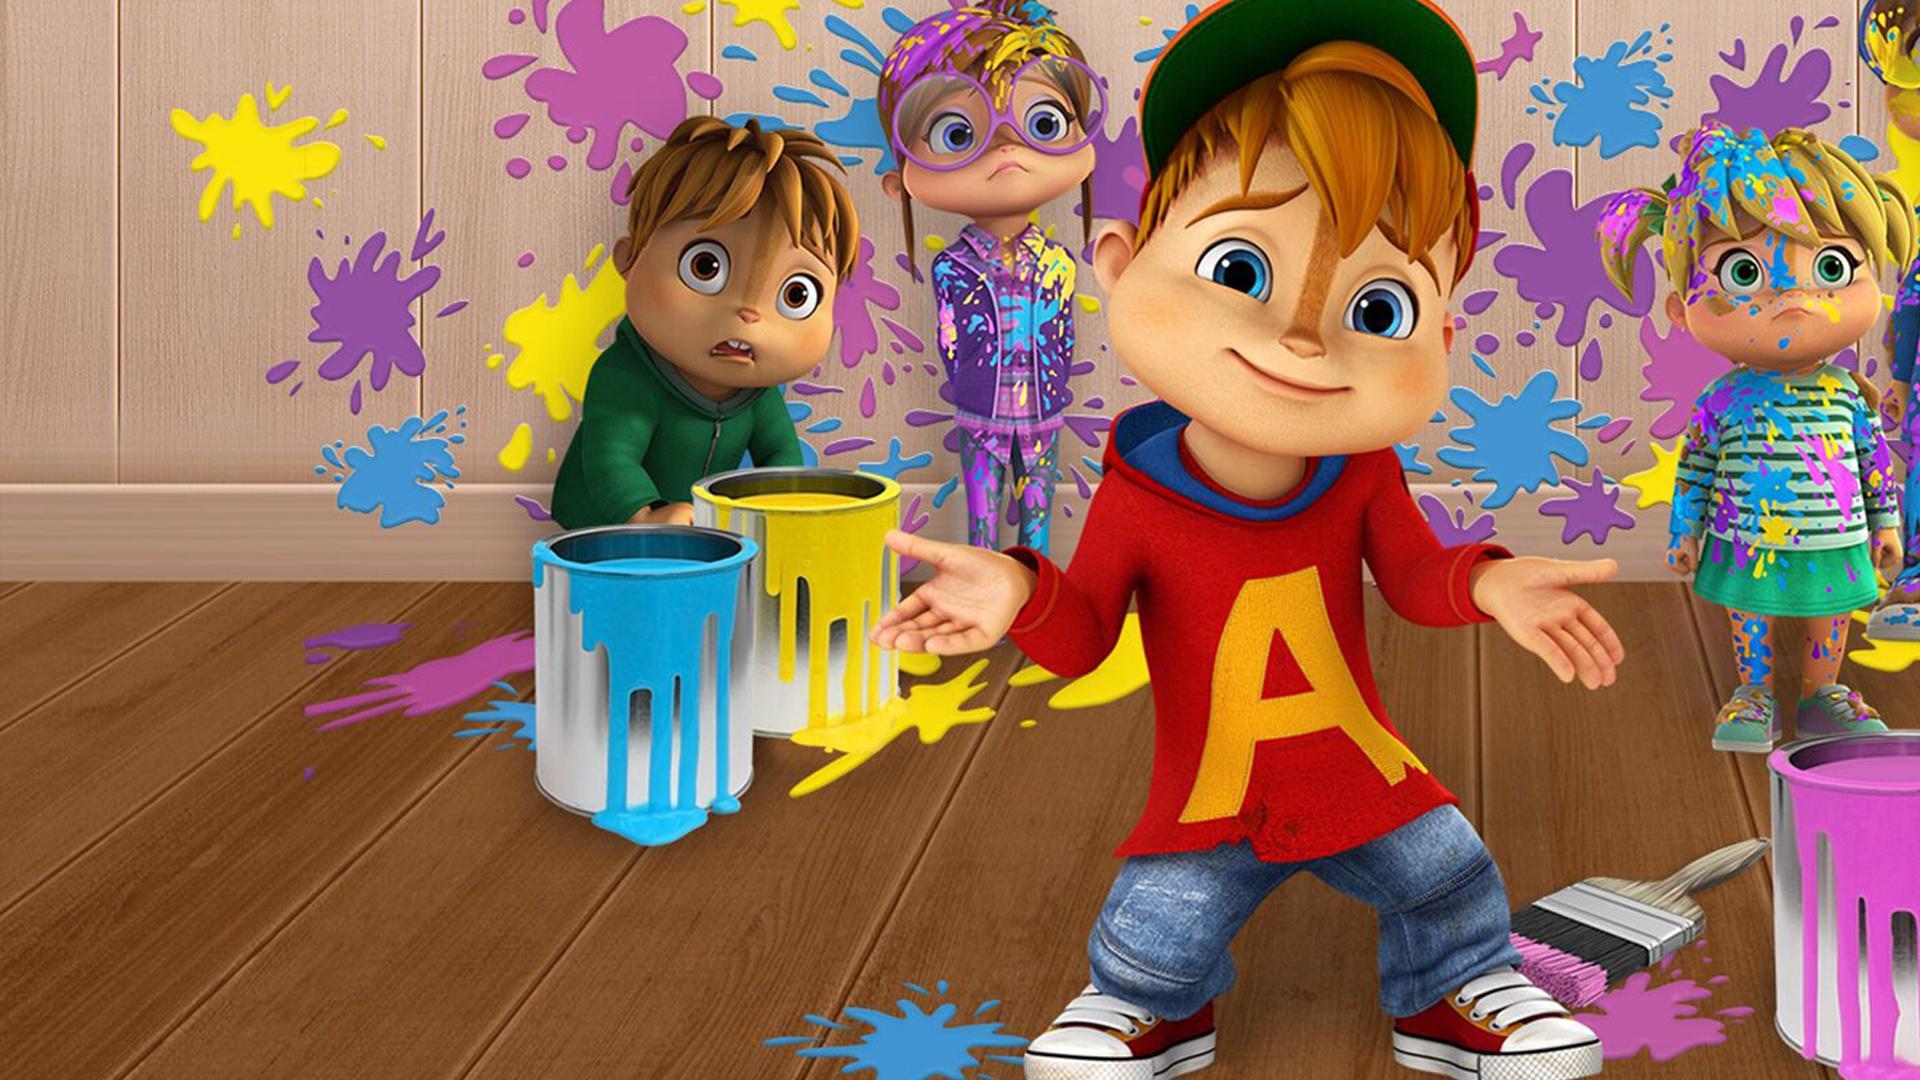 Nick Jr Alvinnn!!! And the Chipmunks